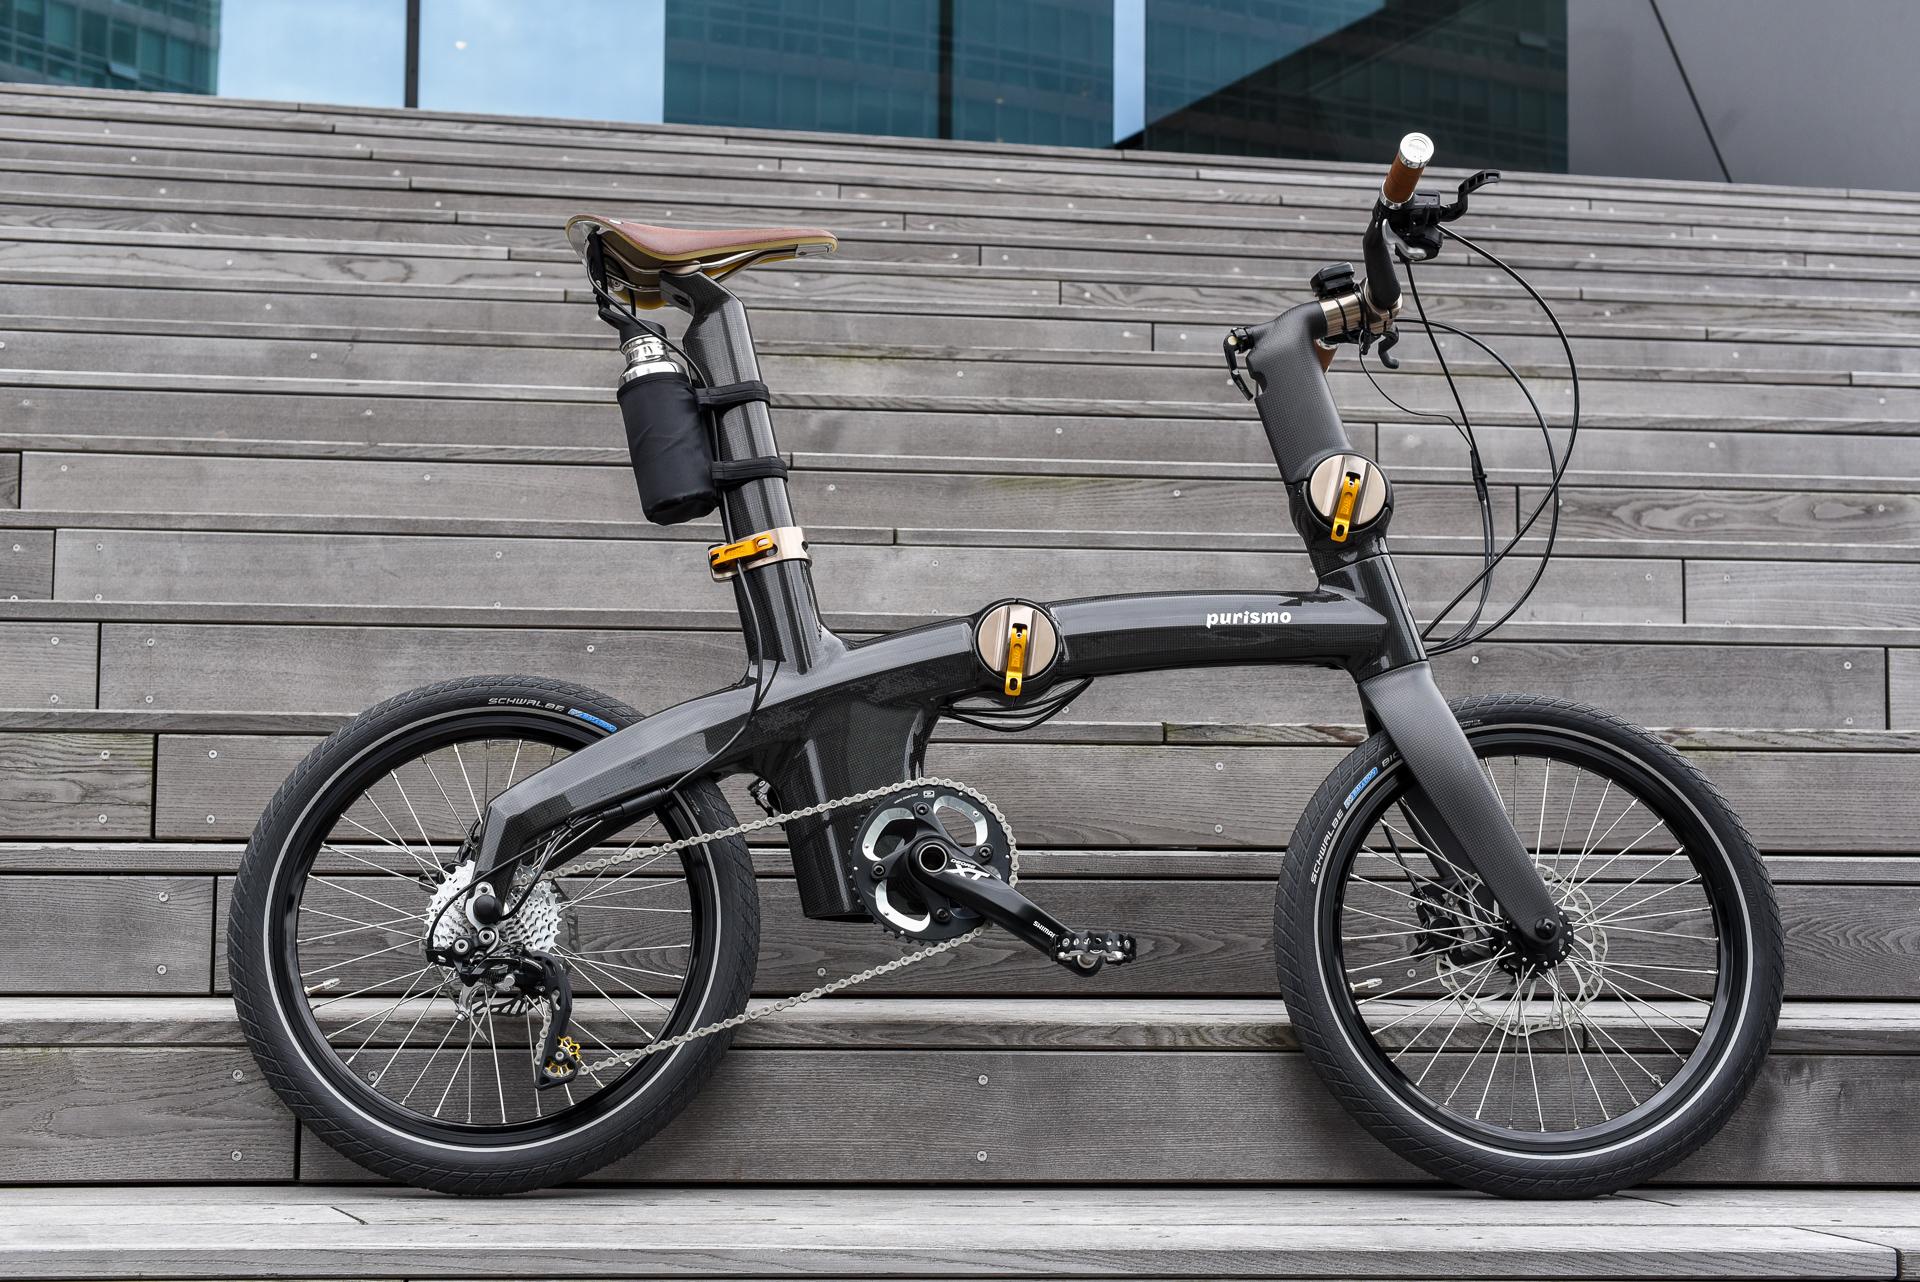 purismo-electric-folding-bike